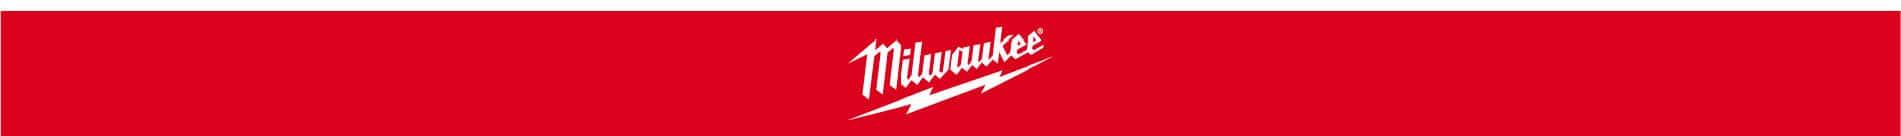 Milwaukee Brand Banner